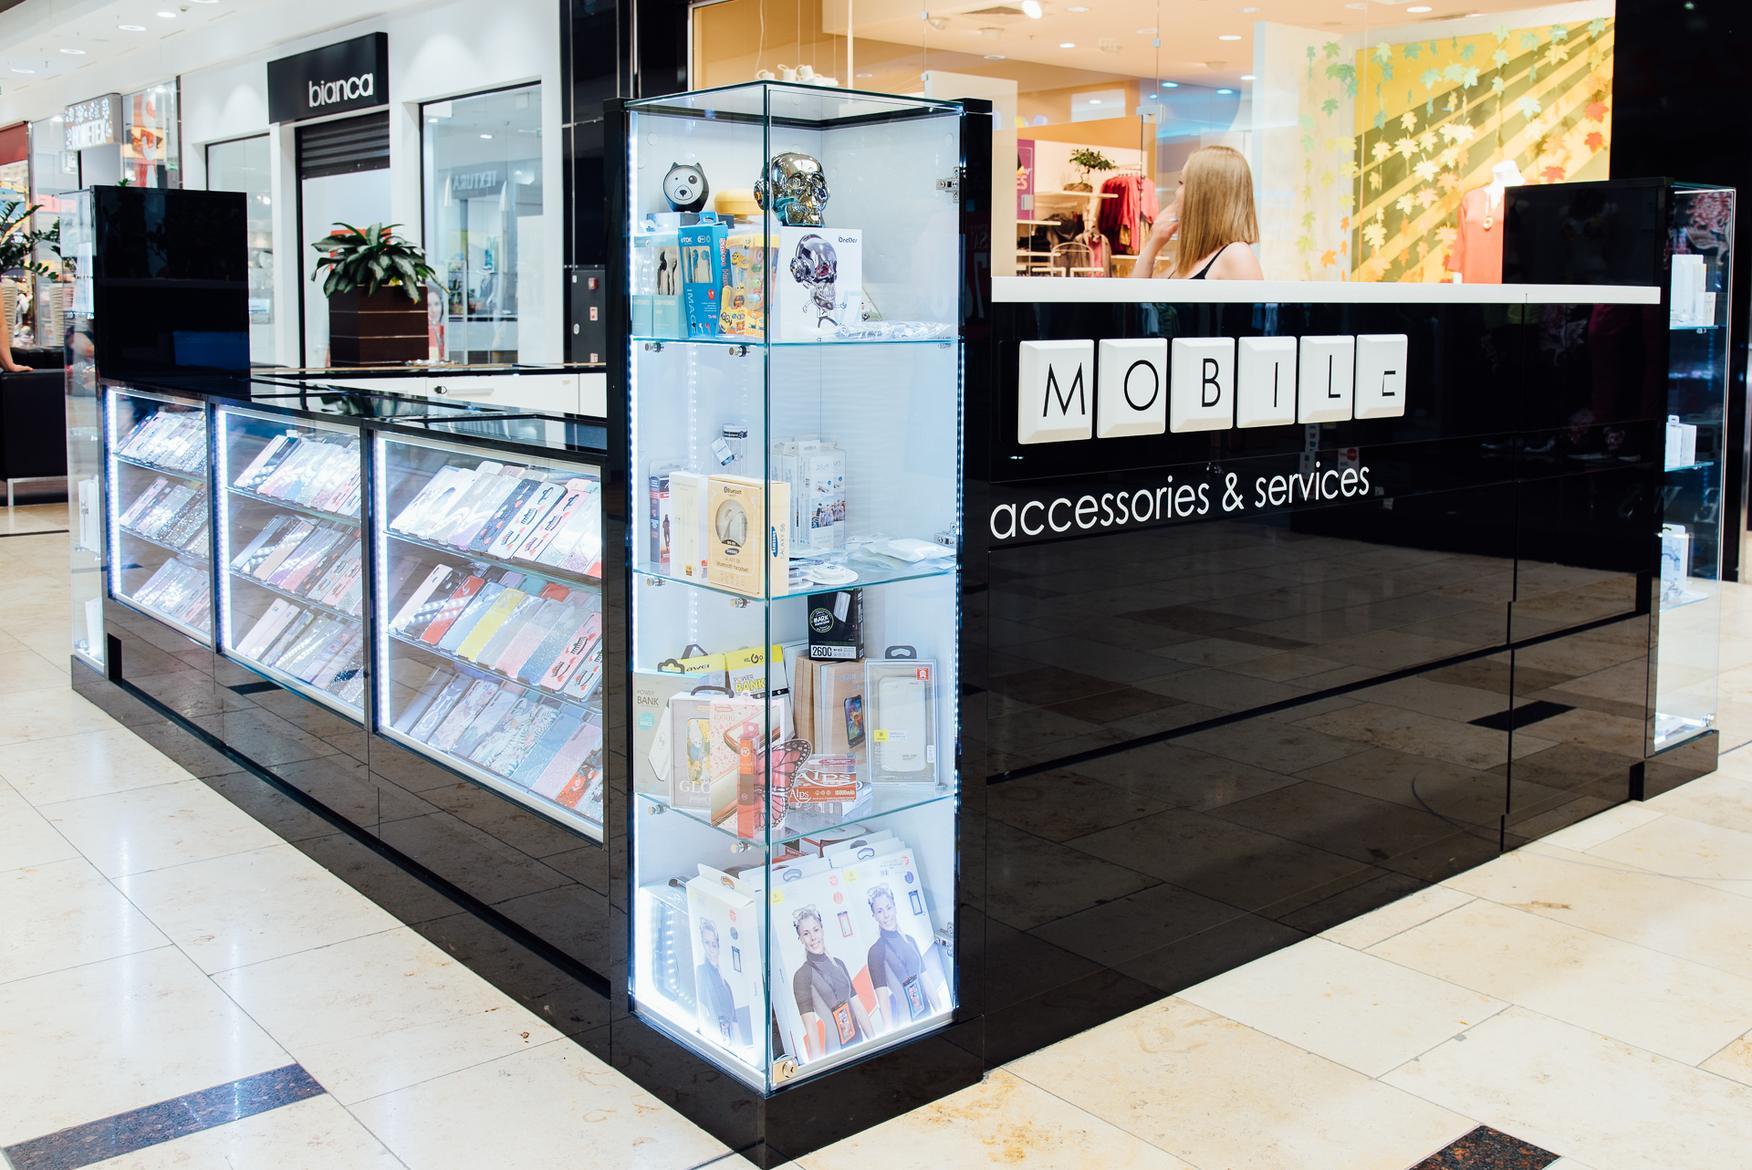 MOBILE accessories & services